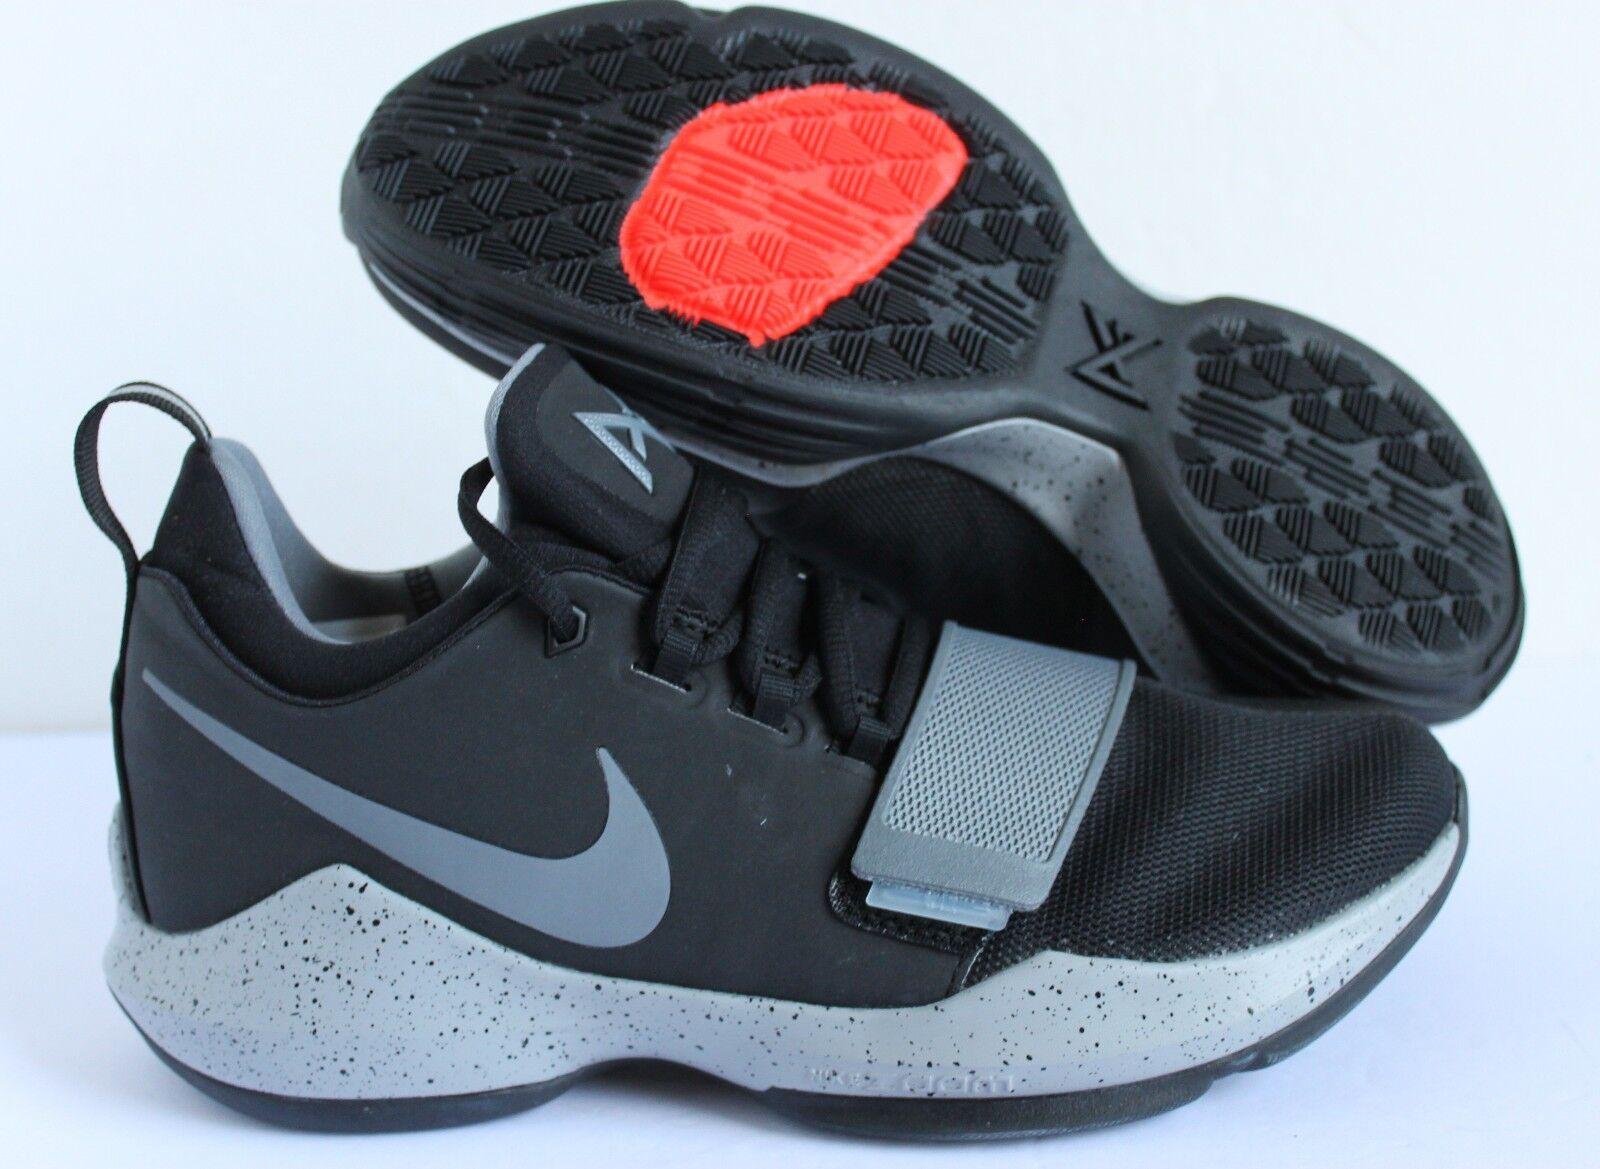 Nike PG 1 Paul George ID Black-Gray SZ Women's 10  [AA1748-991]